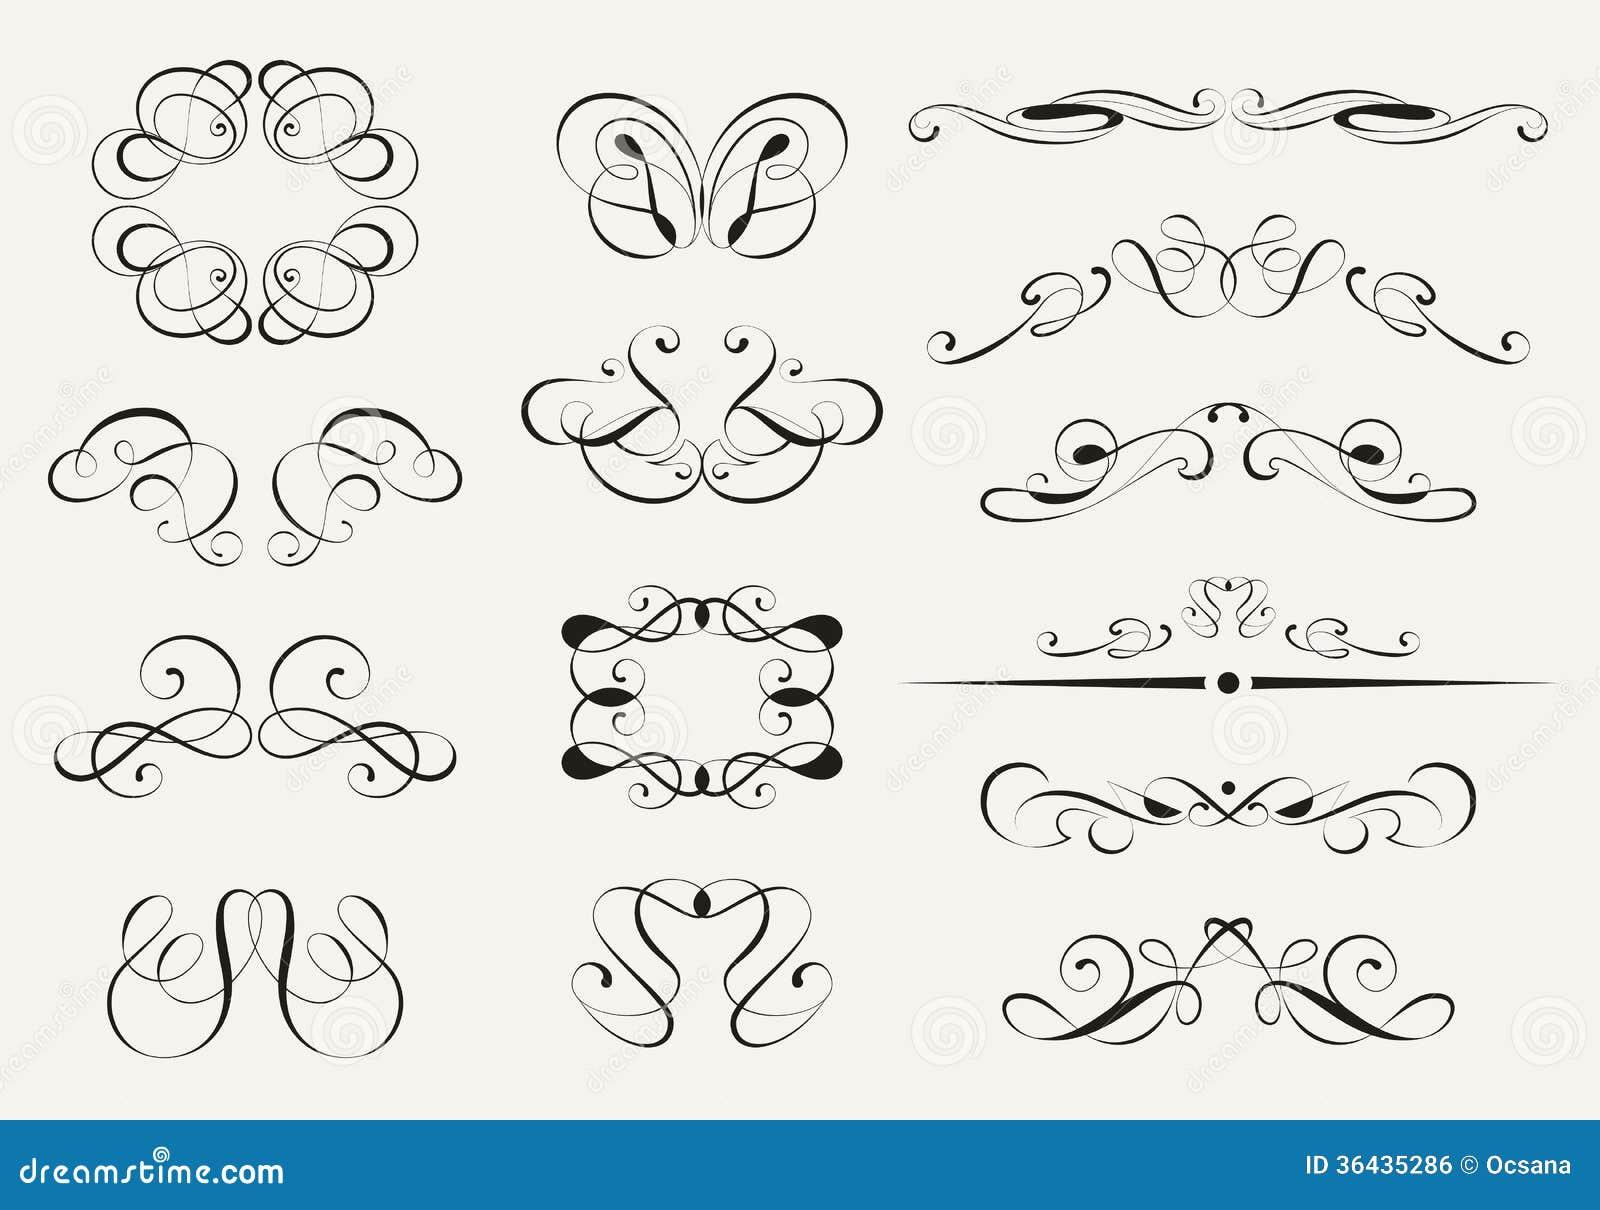 Calligraphy set royalty free stock image